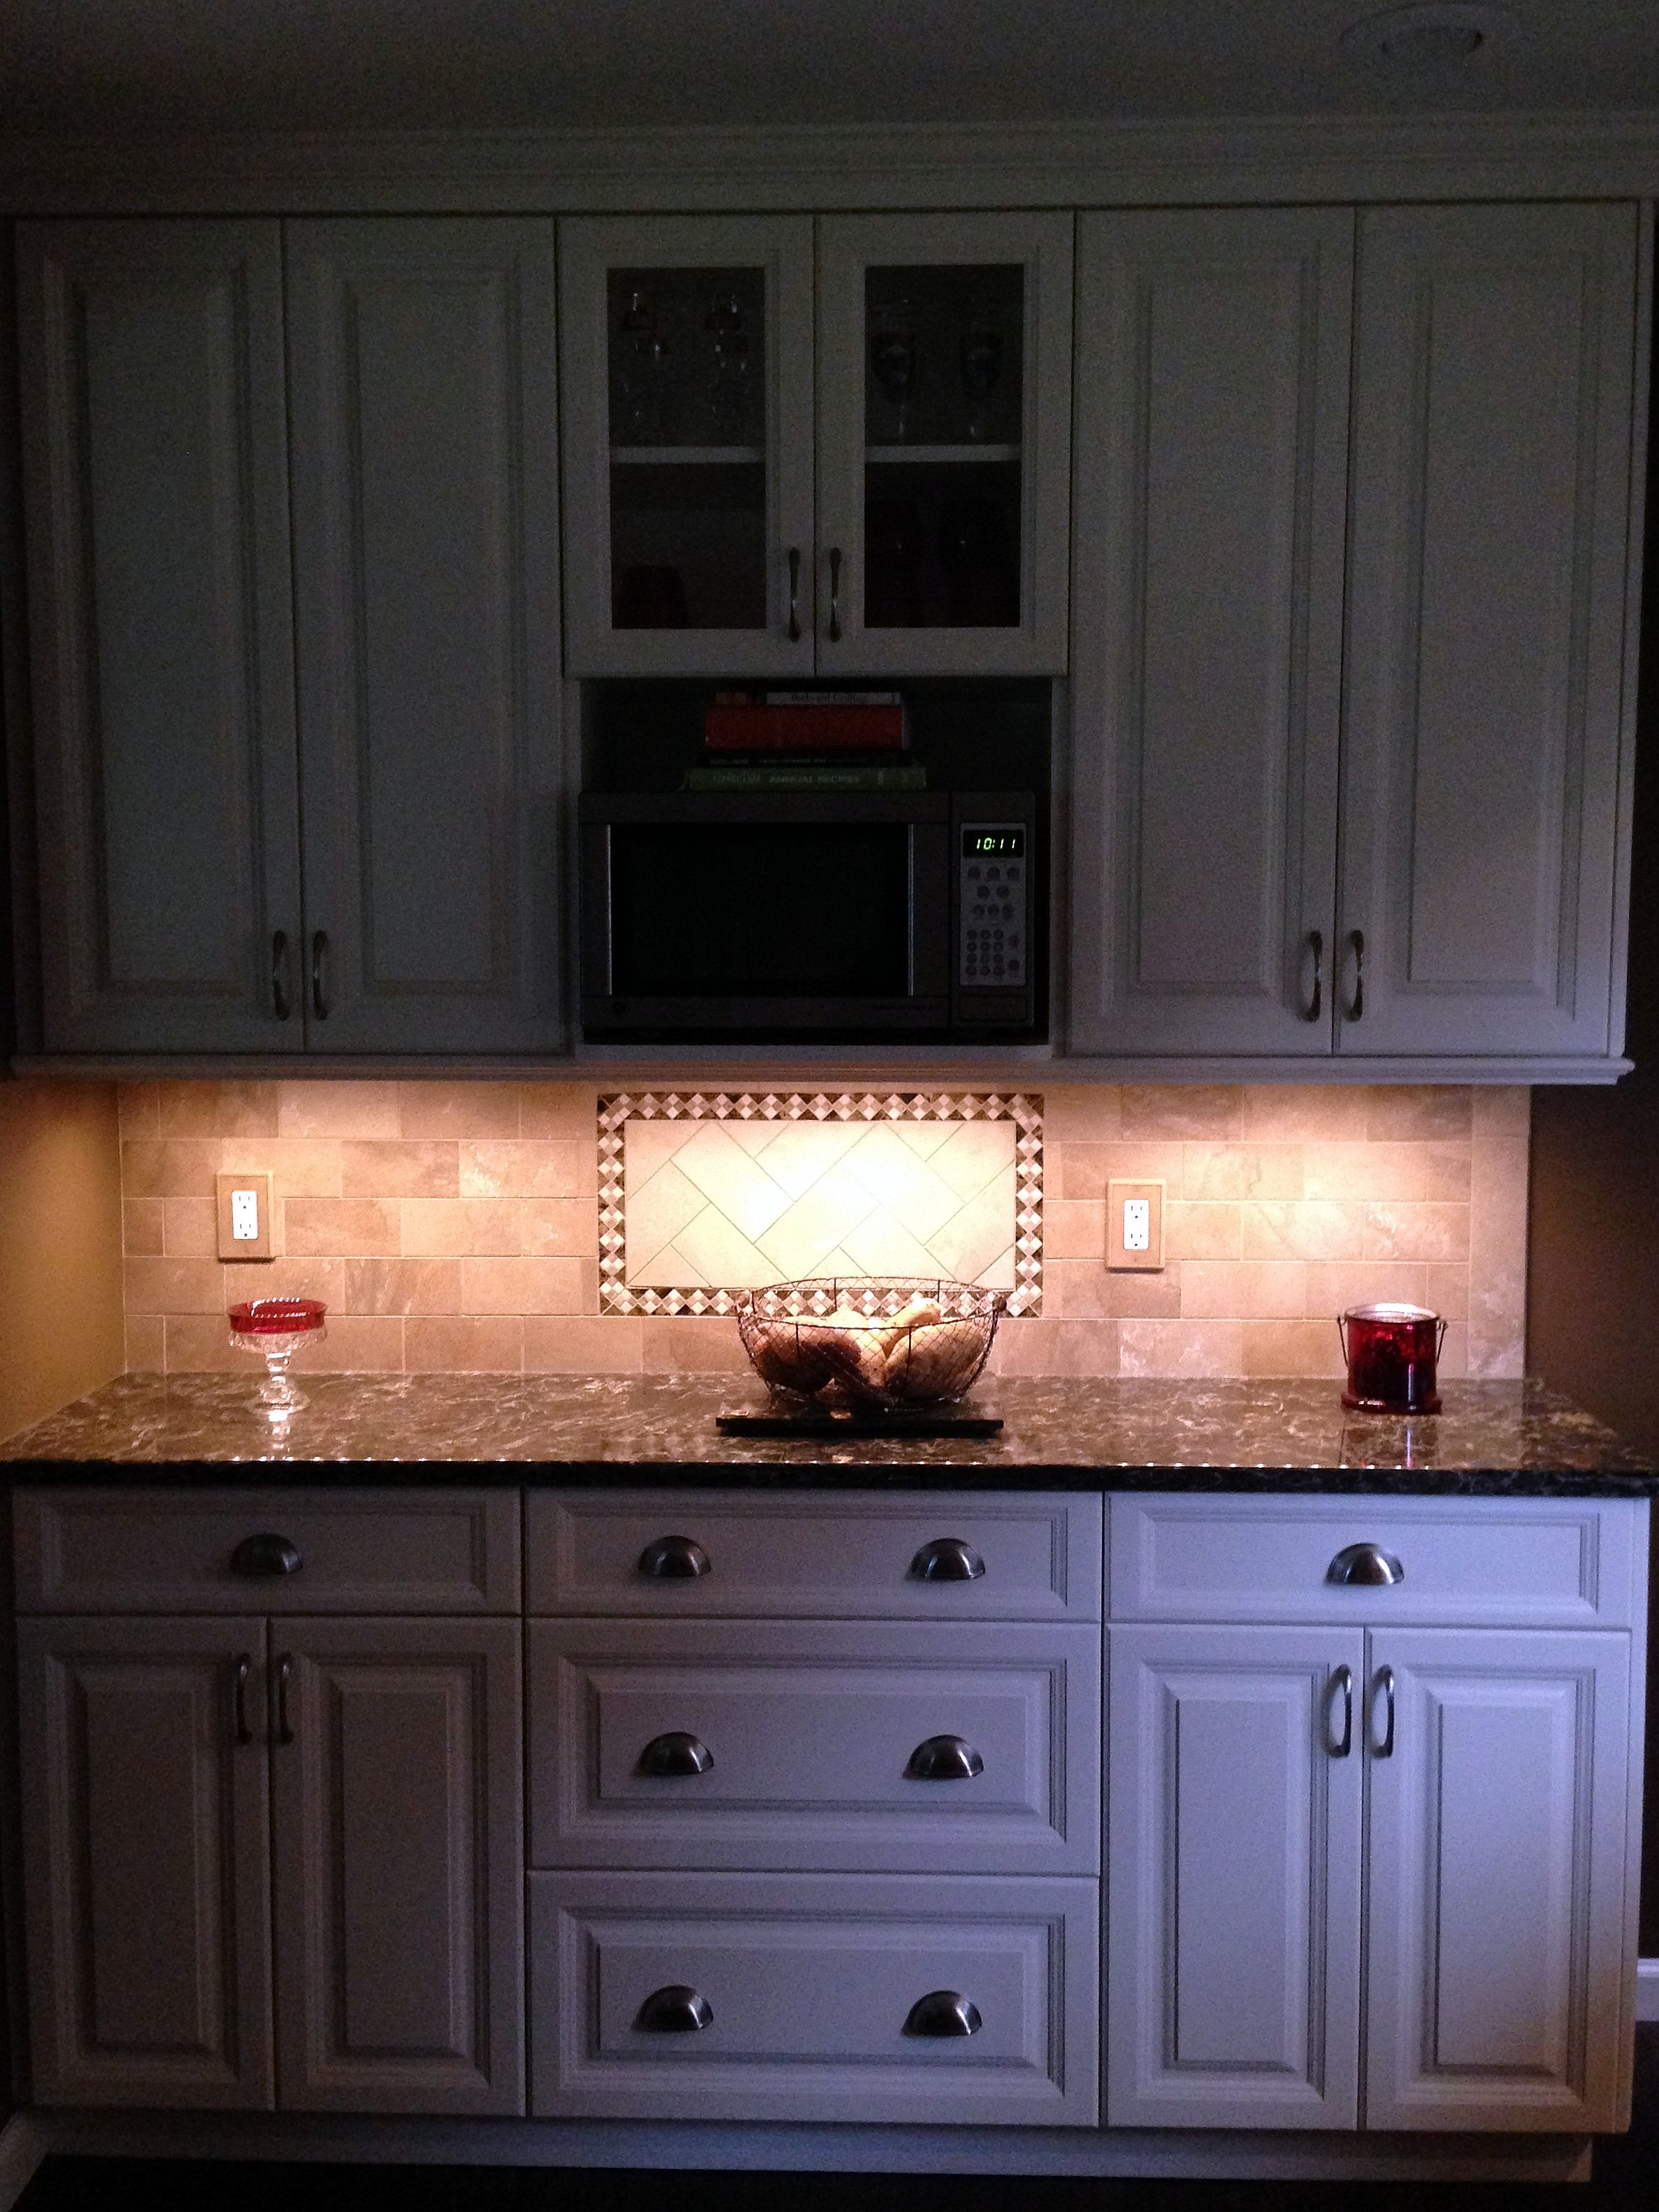 White Millbrook Kitchen With Laneshaw Quartz Countertops 2 Of 10 Kitchen Remodel Kitchen Kitchen Cabinets